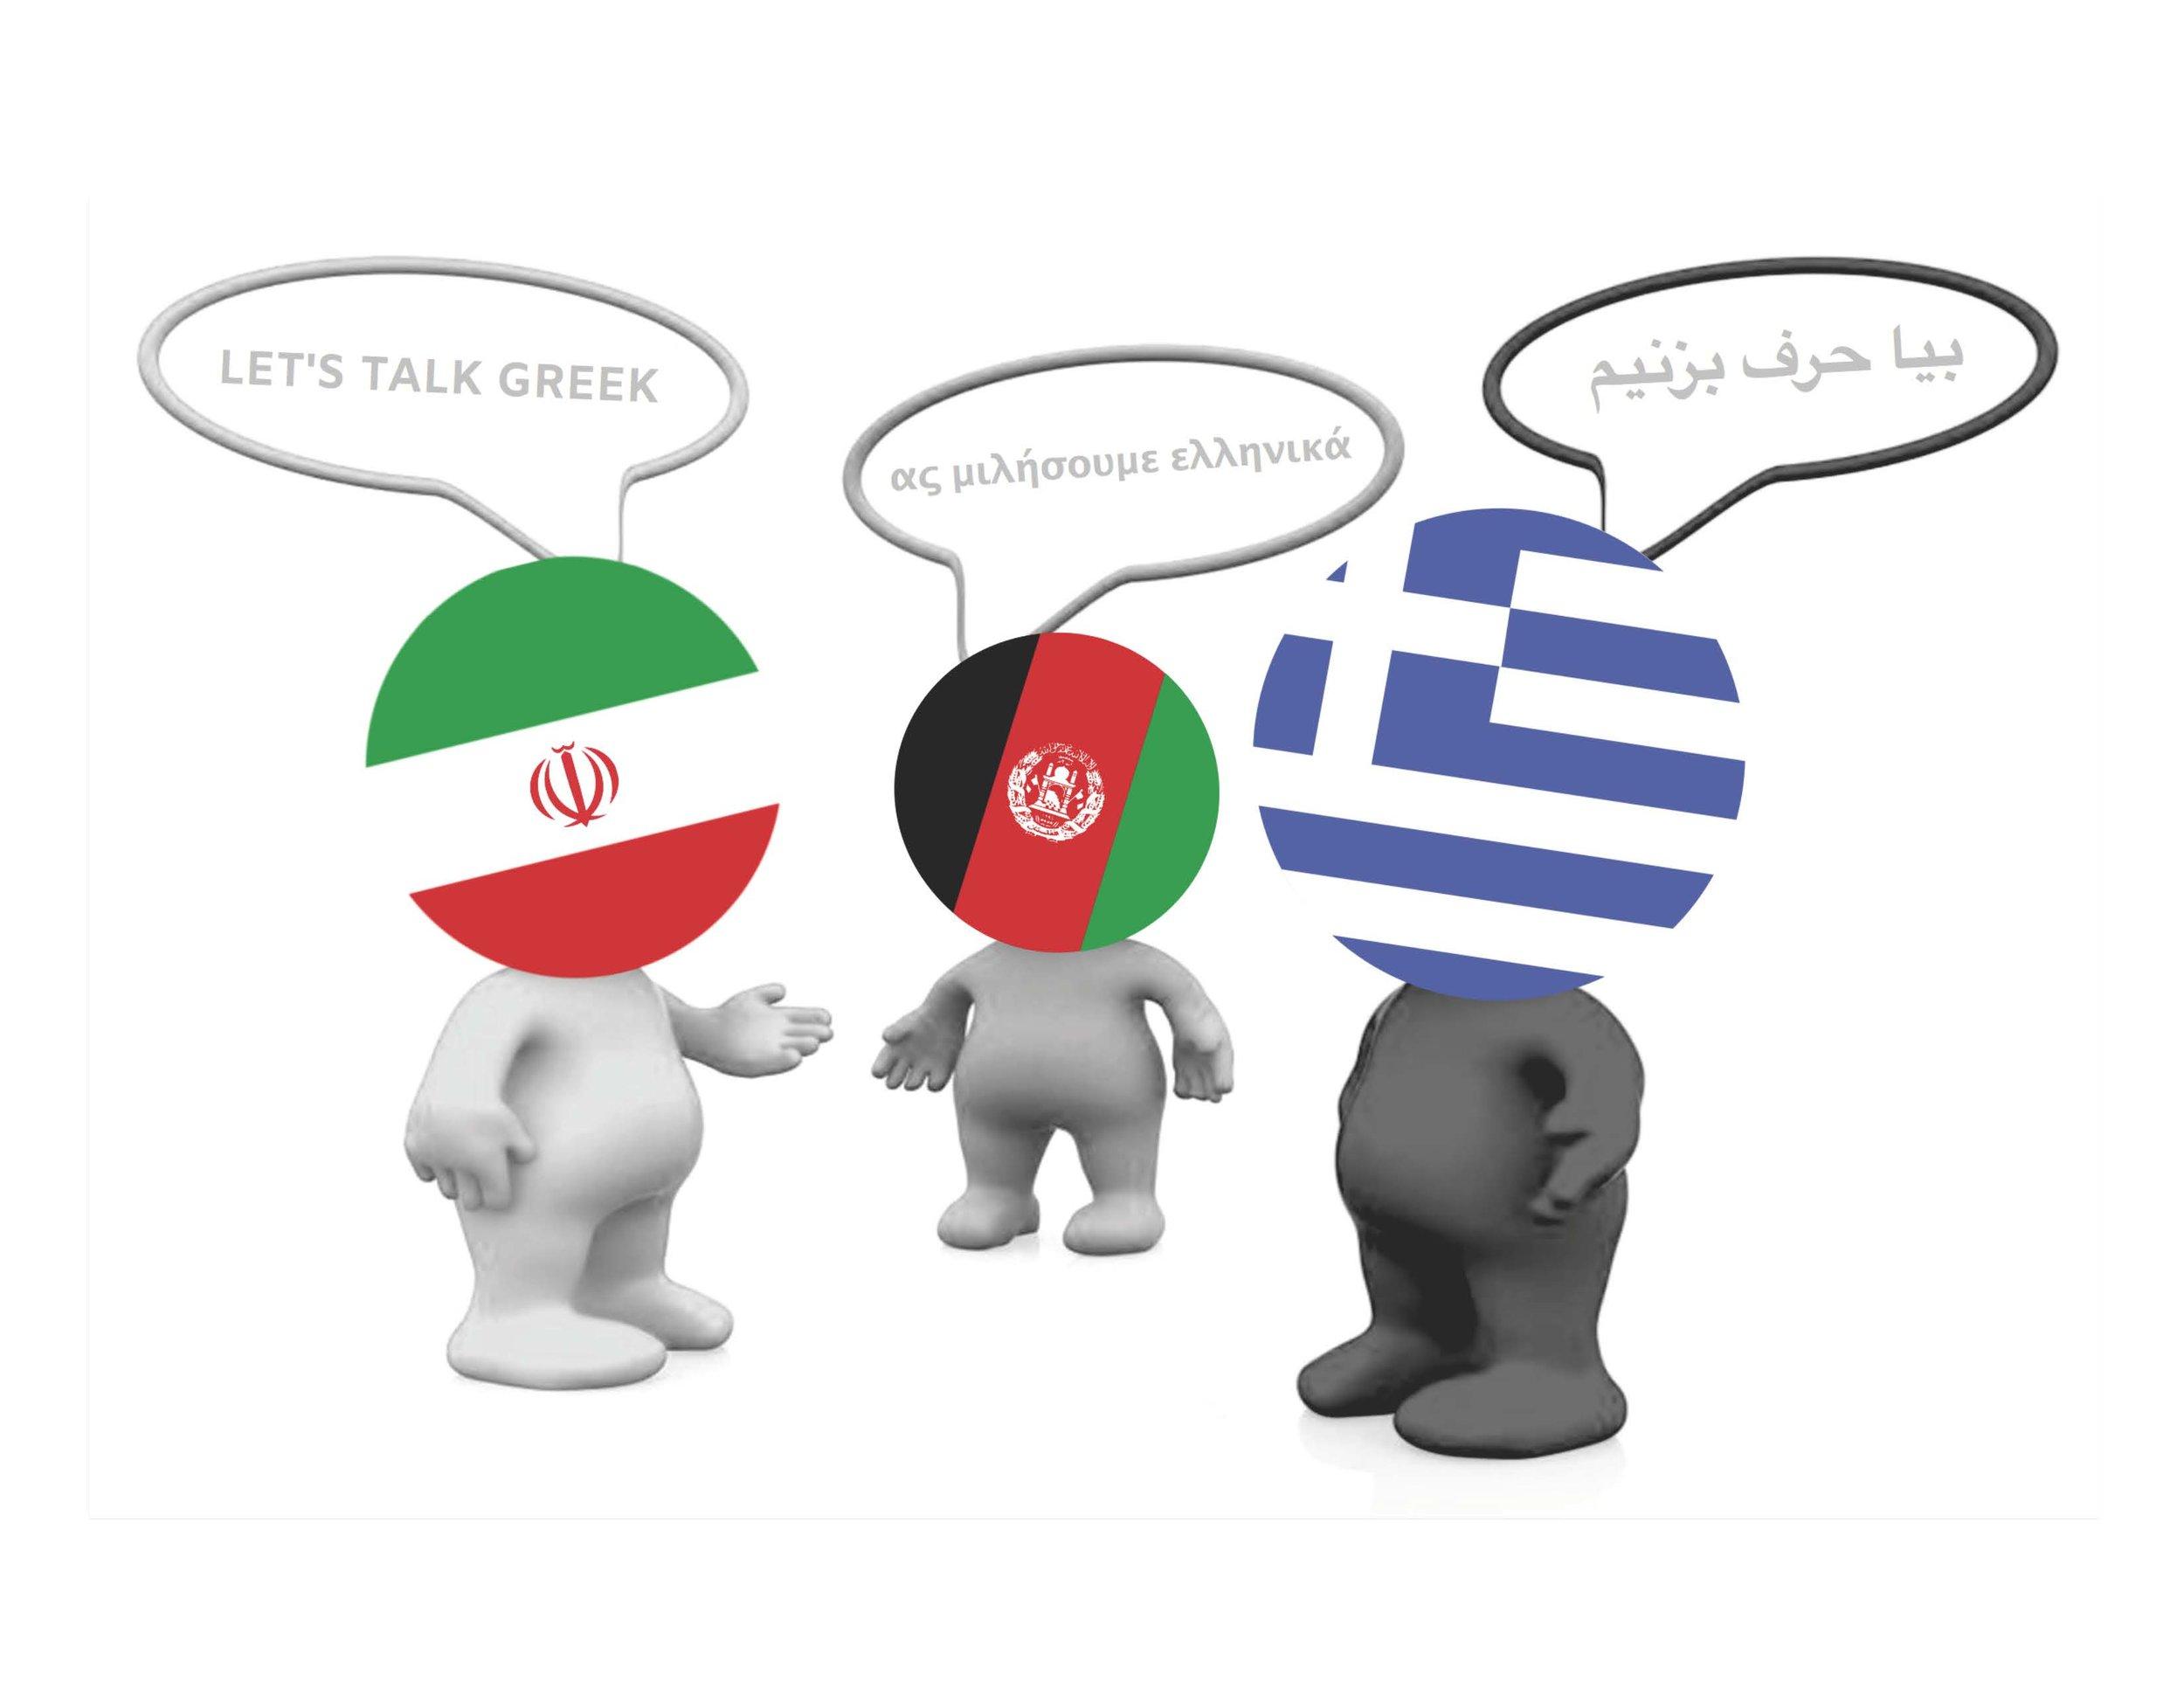 Let's Talk Greek Poster.jpg